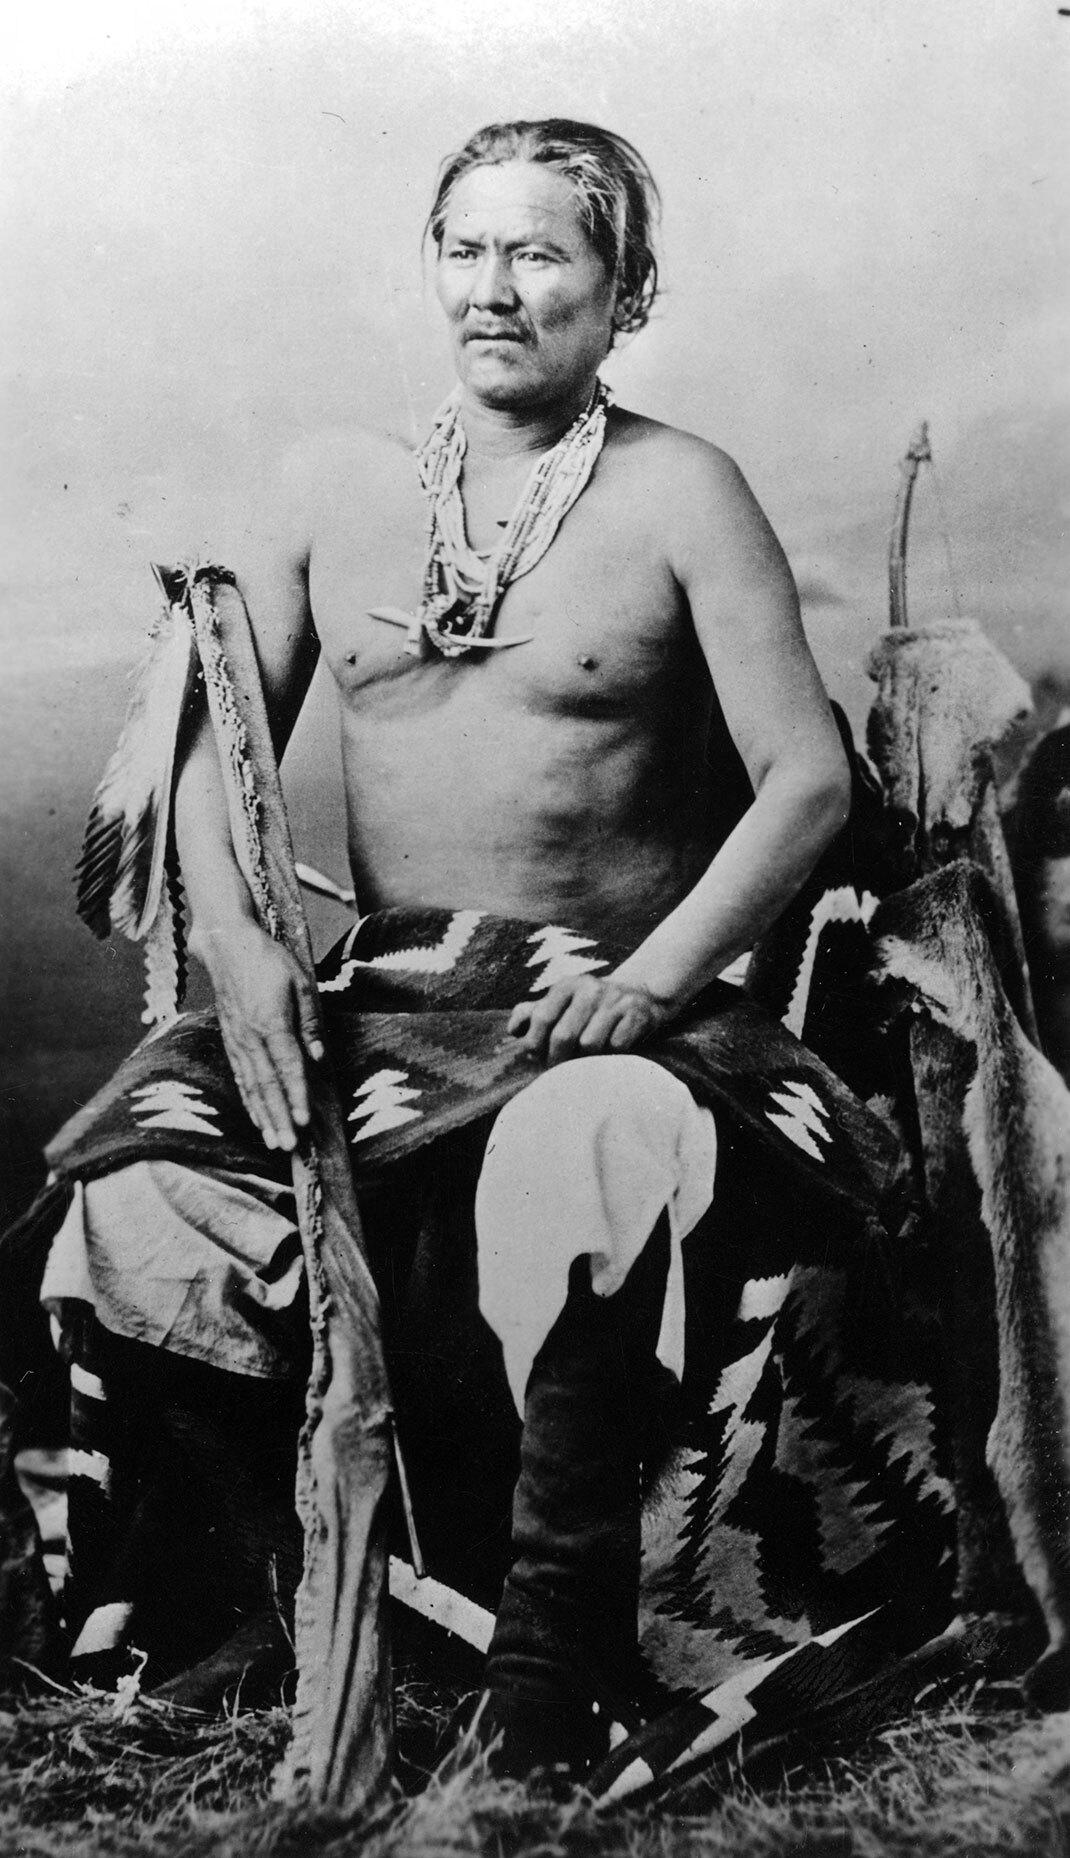 indien-Manuelito